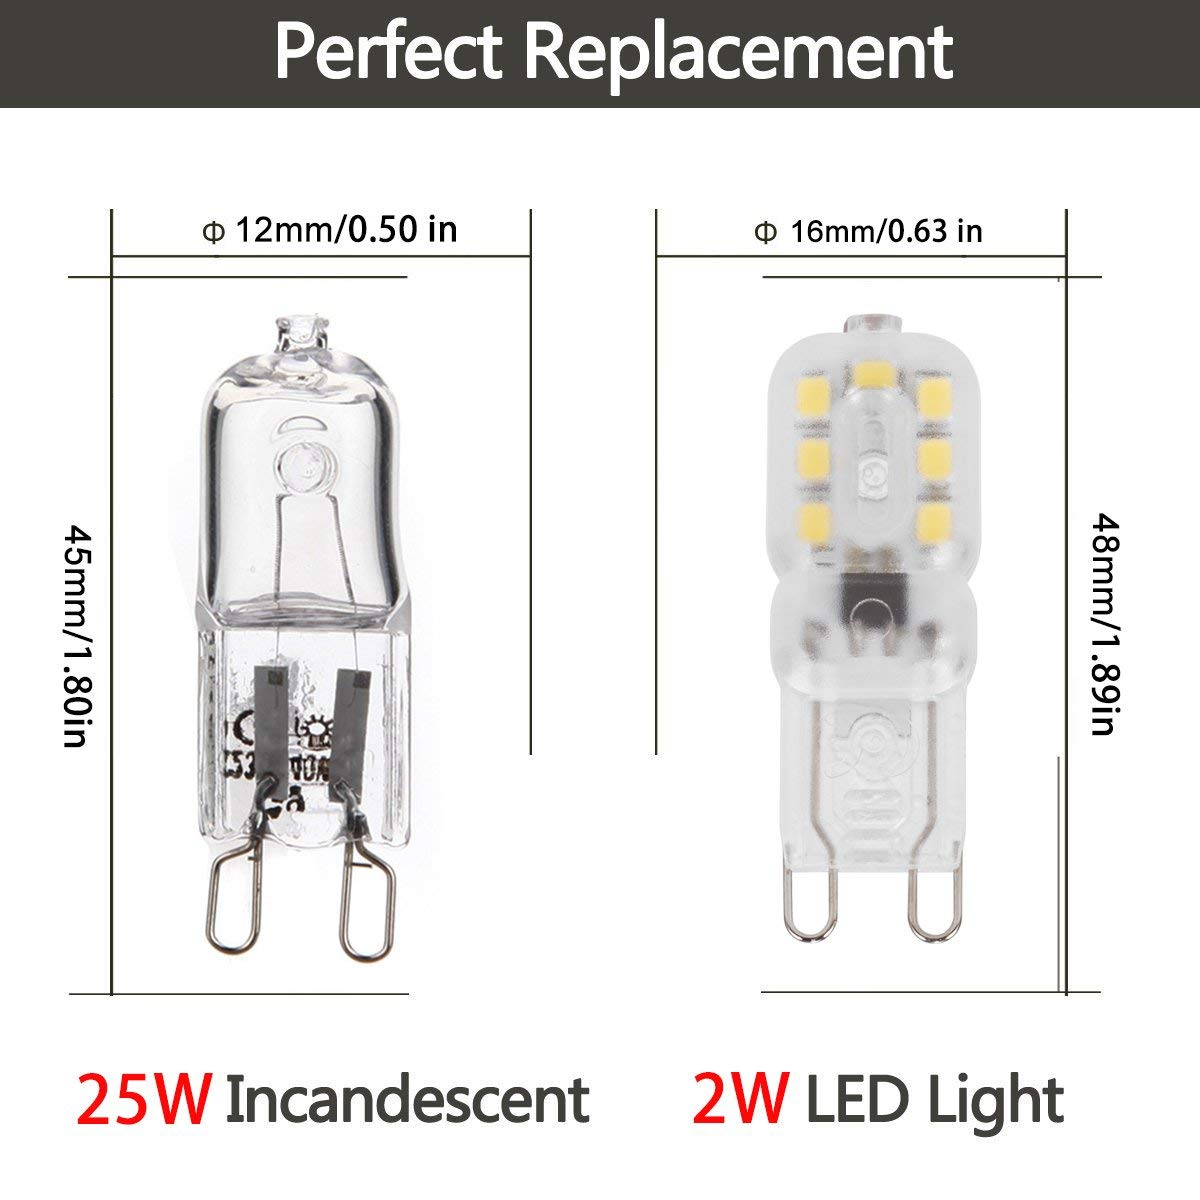 US $19 98 |G9 LED Bulbs 25W Halogen Bulbs Equivalent 2 Watt Cool White  6000K/200lm 360 Beam Angle Energy Saving [Energy Class A+] 10Pack,-in LED  Bulbs